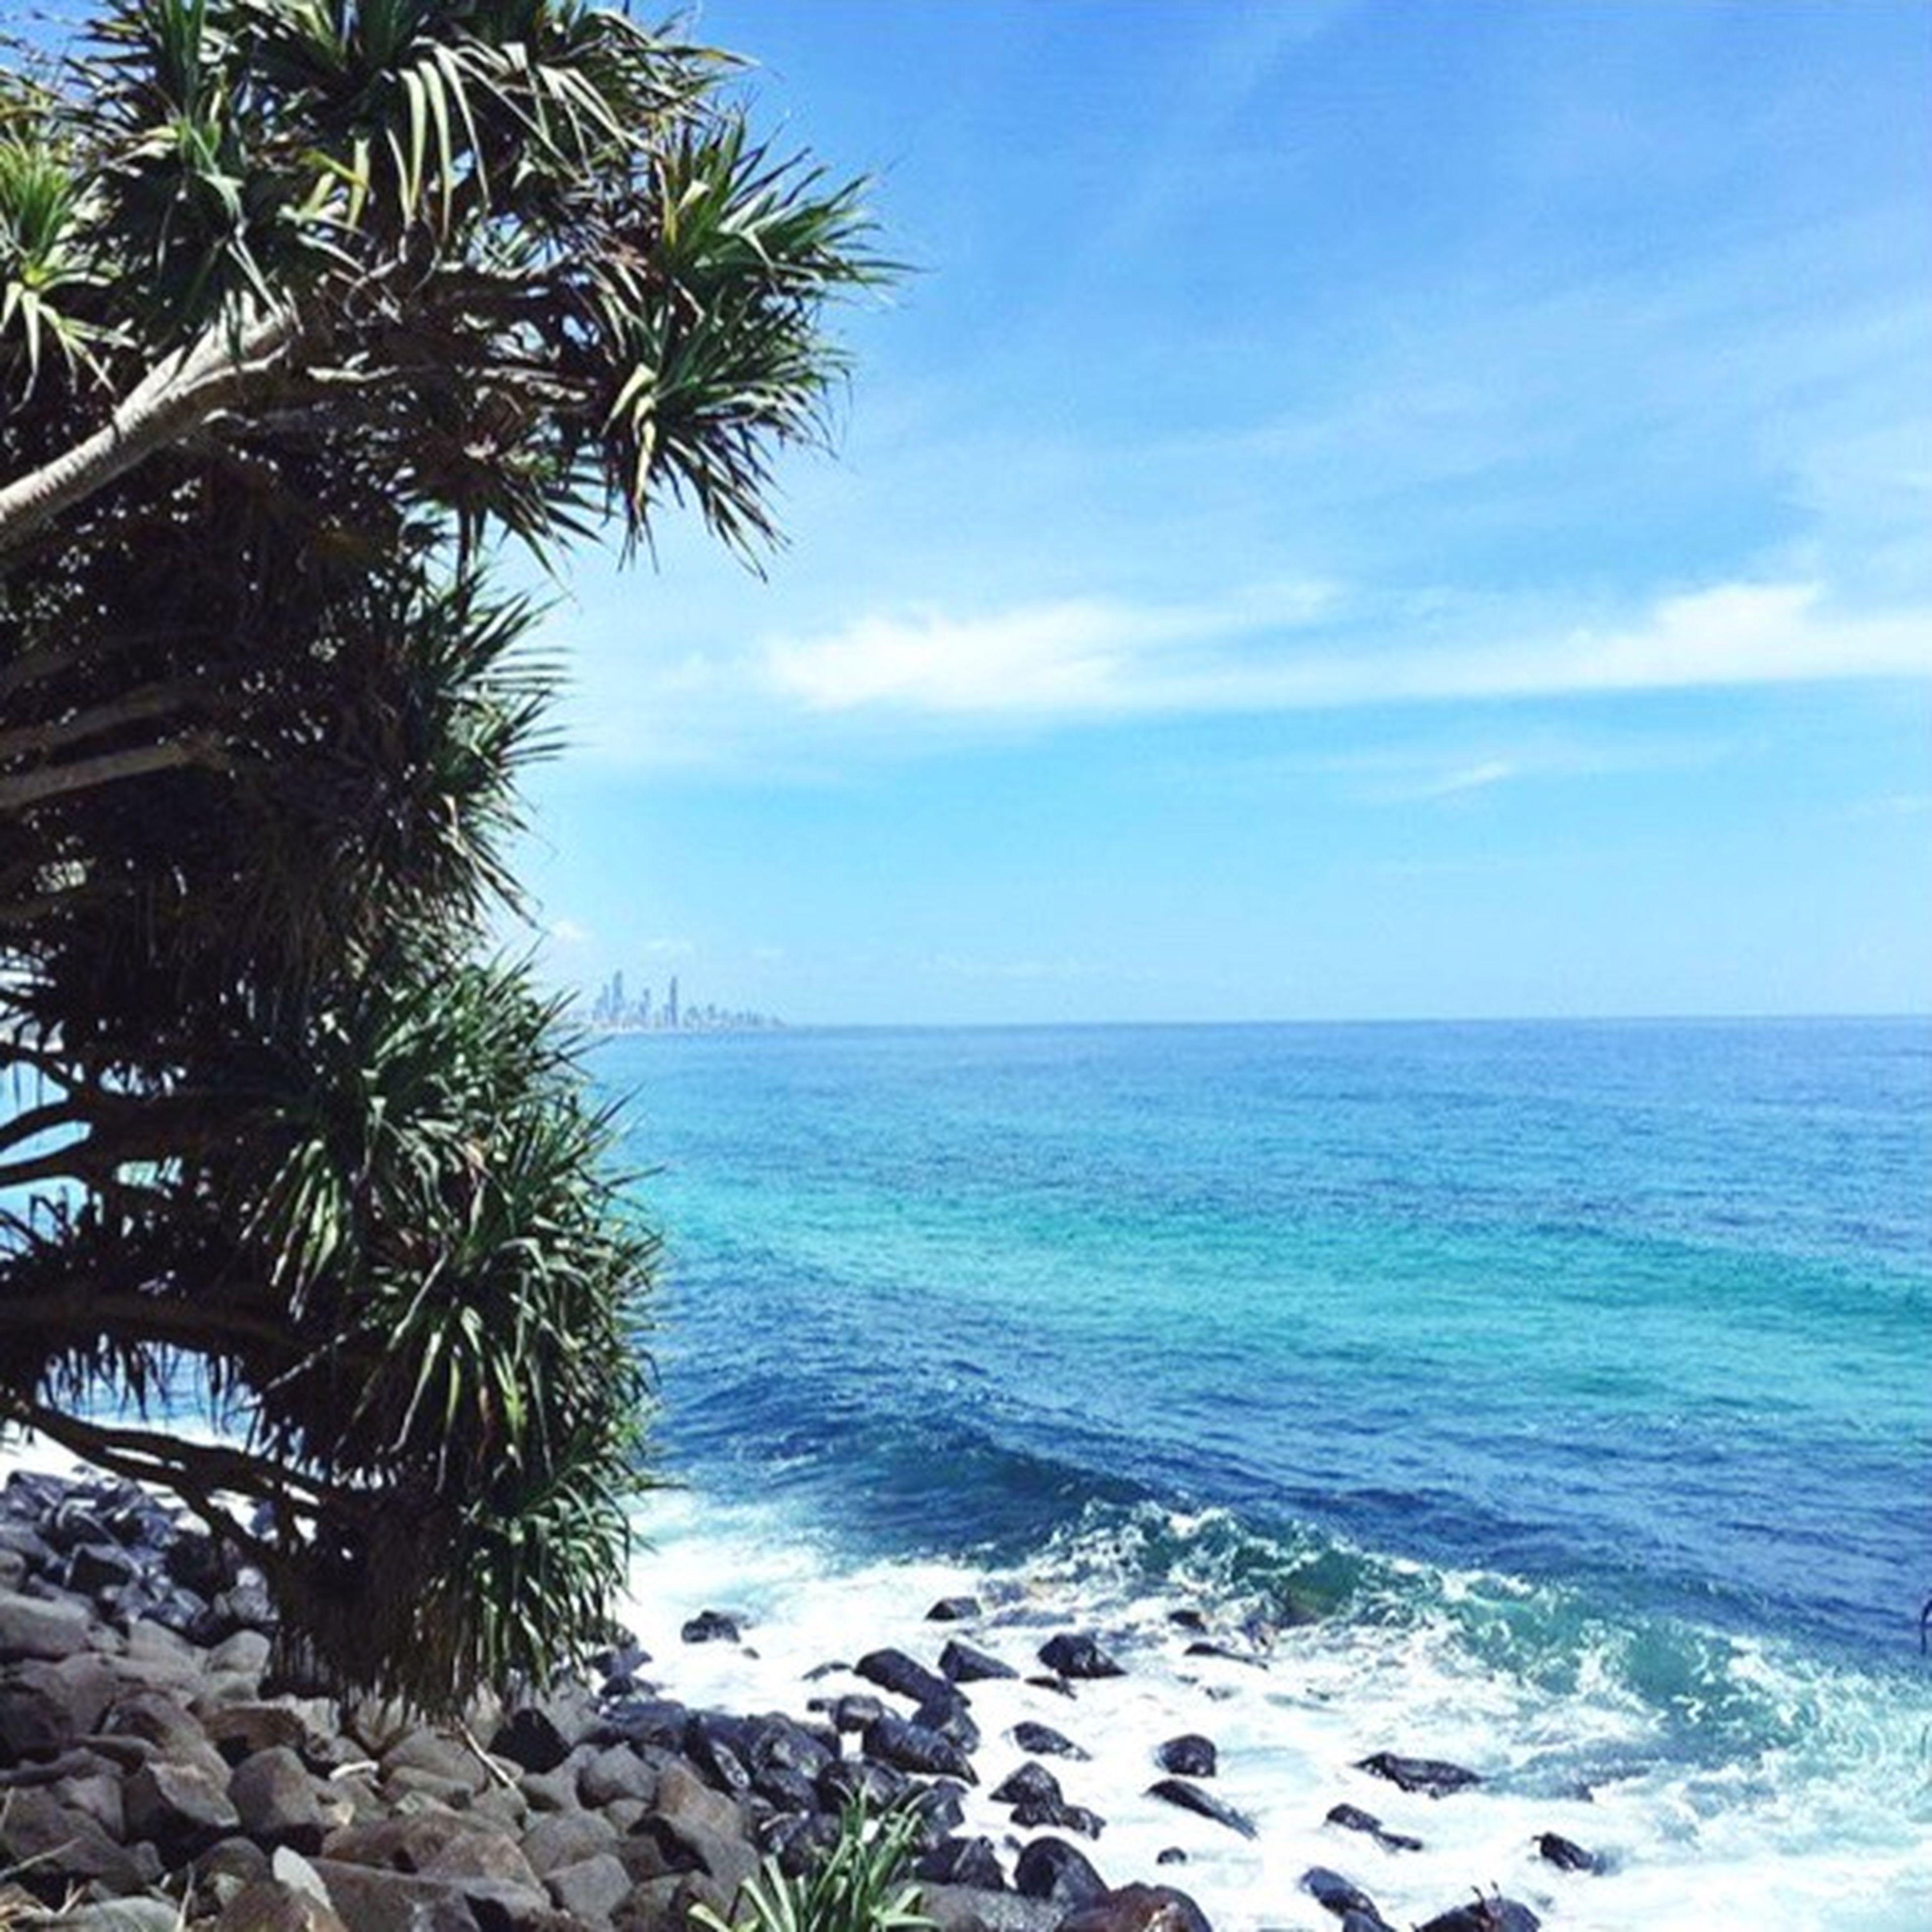 sea, horizon over water, water, beach, tranquil scene, palm tree, scenics, sky, tranquility, beauty in nature, tree, nature, shore, blue, idyllic, cloud, coastline, sand, cloud - sky, rock - object